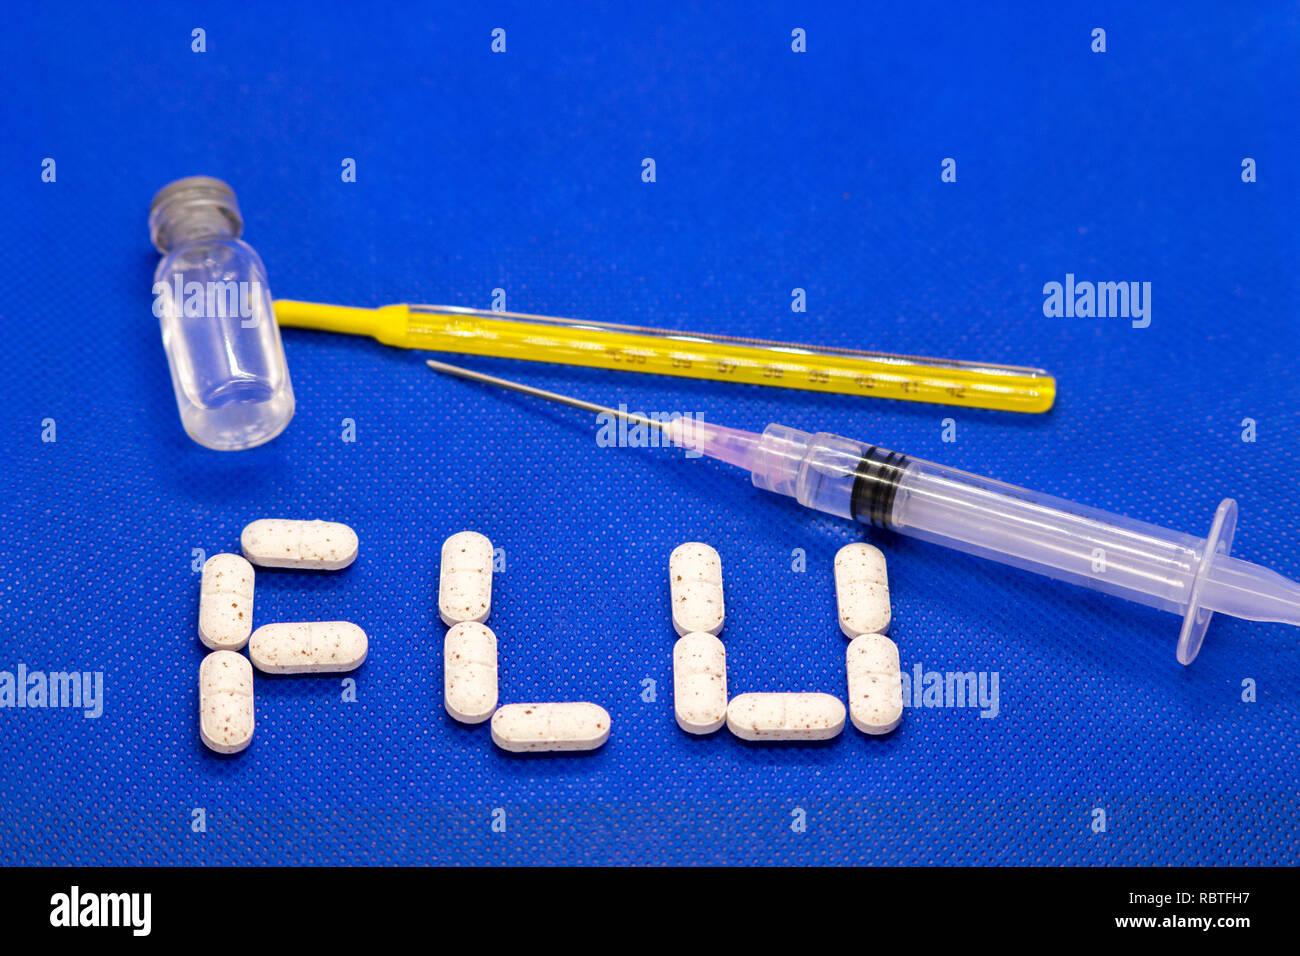 Set of cold medicine and flu virus on blue background.  Antibiotics, homeopathy, pills. Medicine and drug concept. - Stock Image